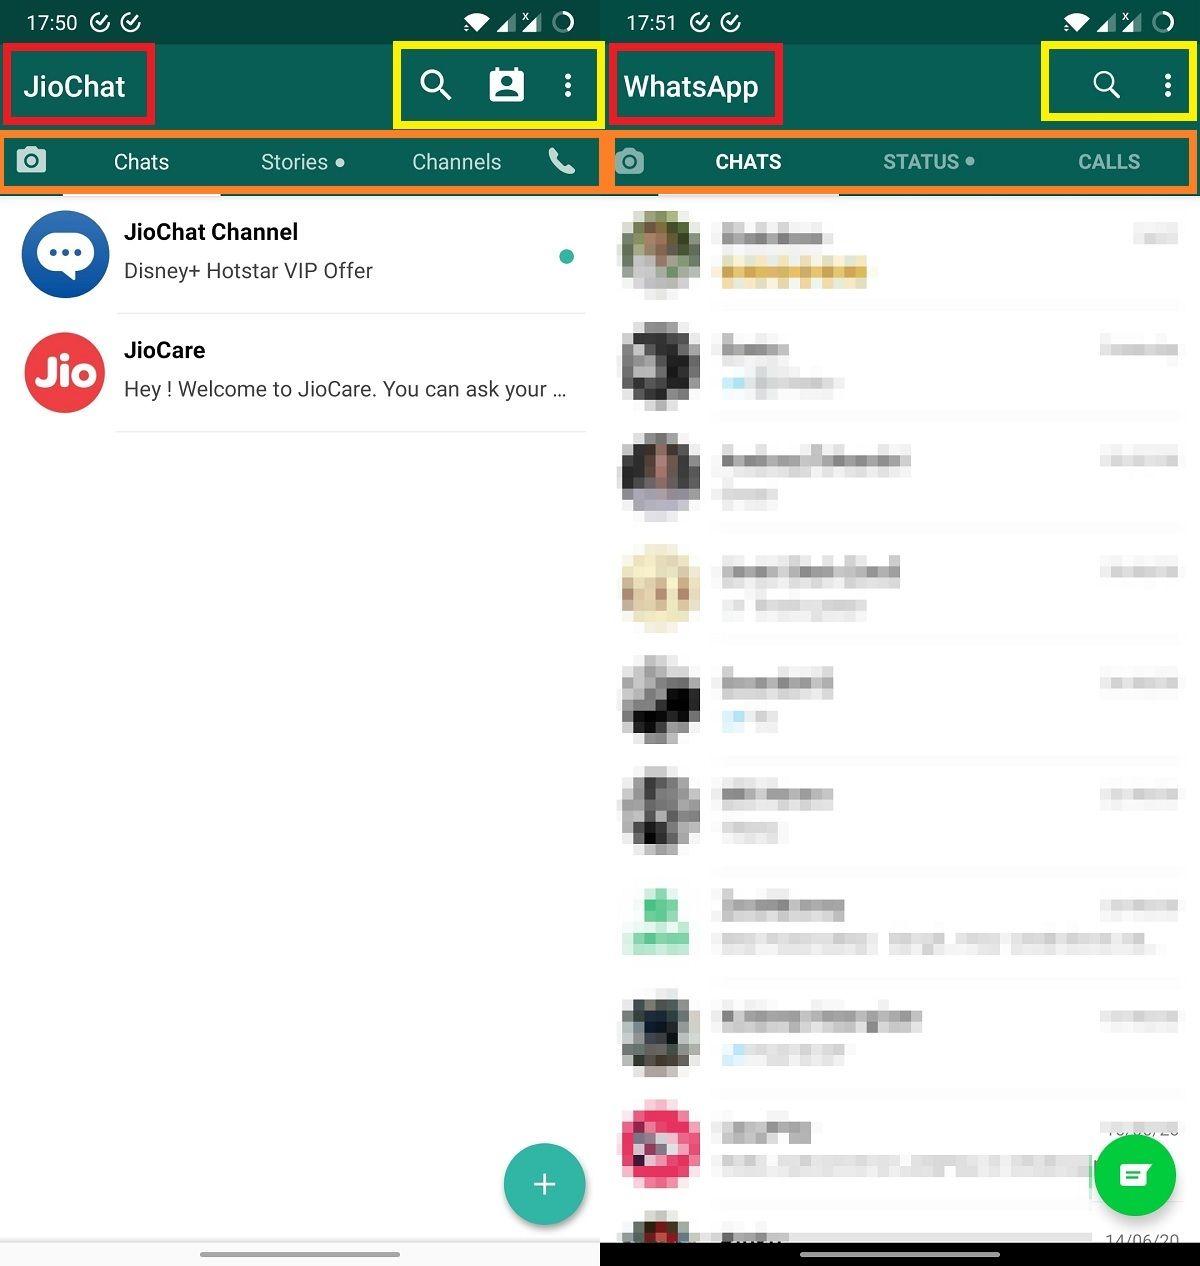 Diferencias entre JioChat y WhatsApp